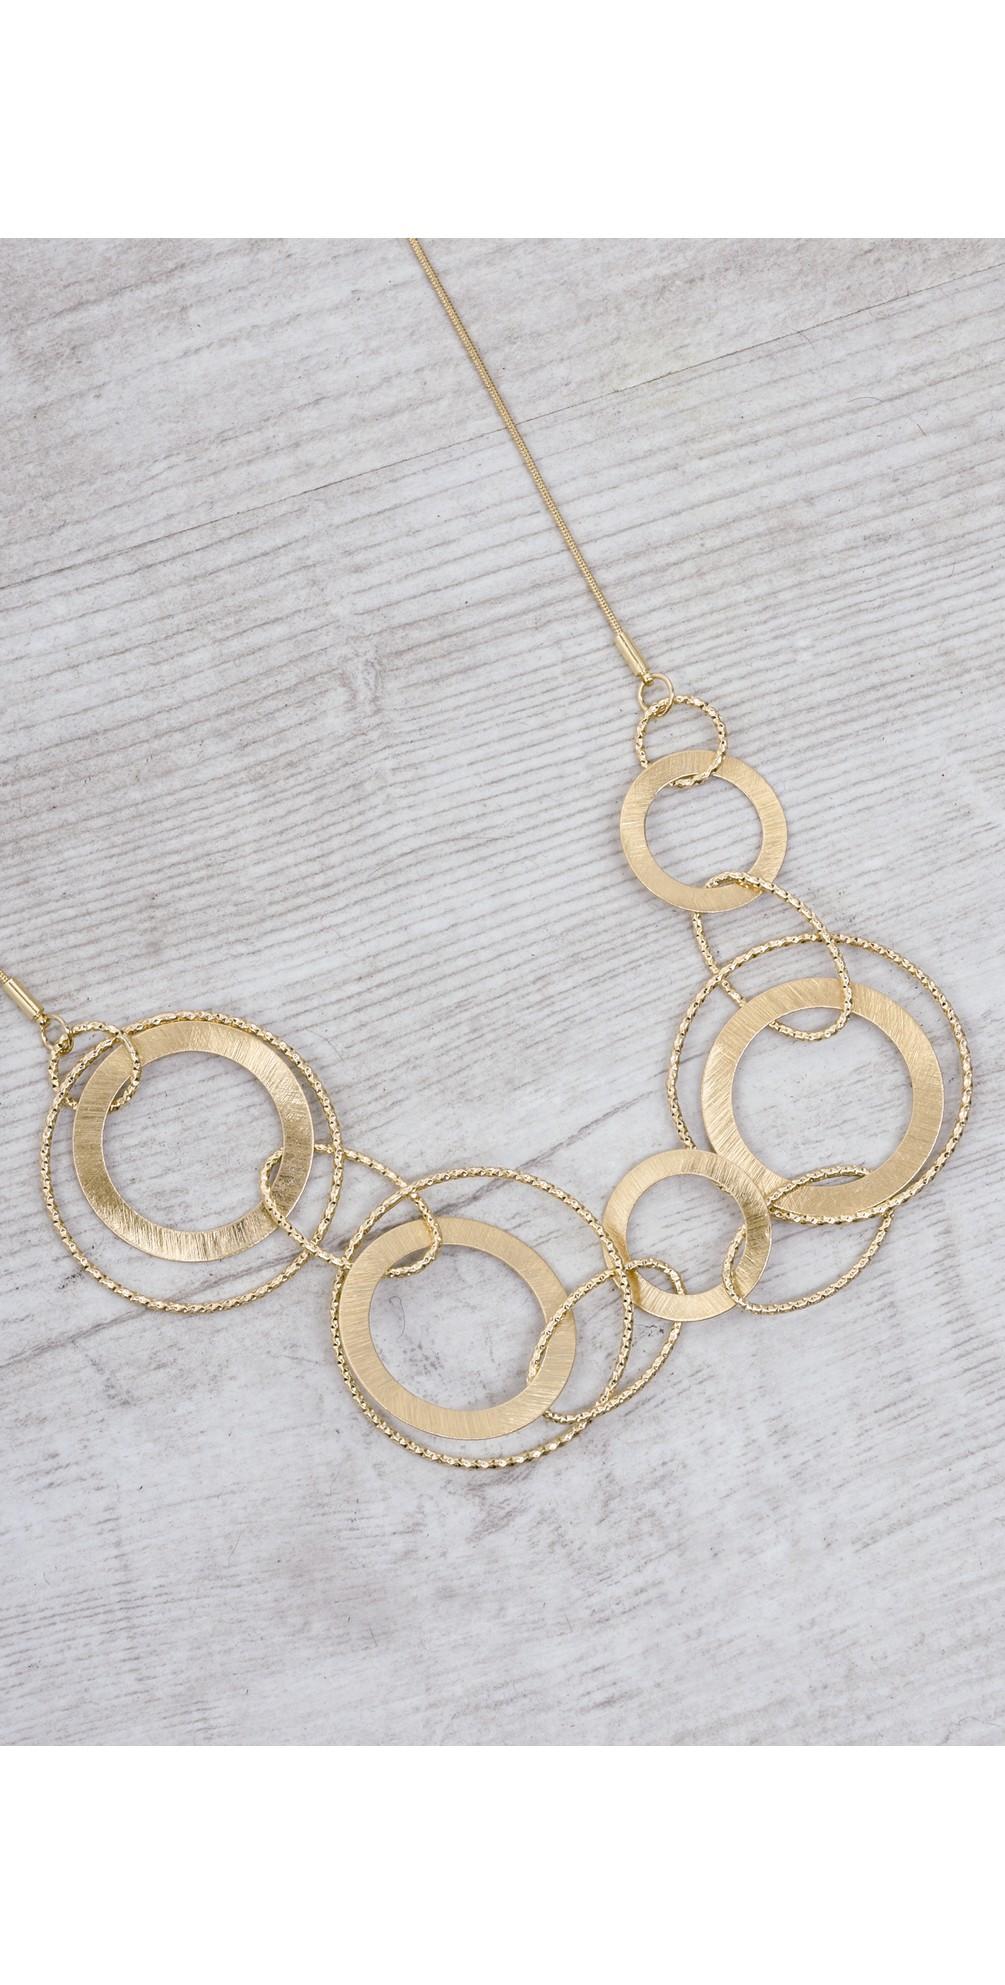 Alyssa Double Circles Necklace main image